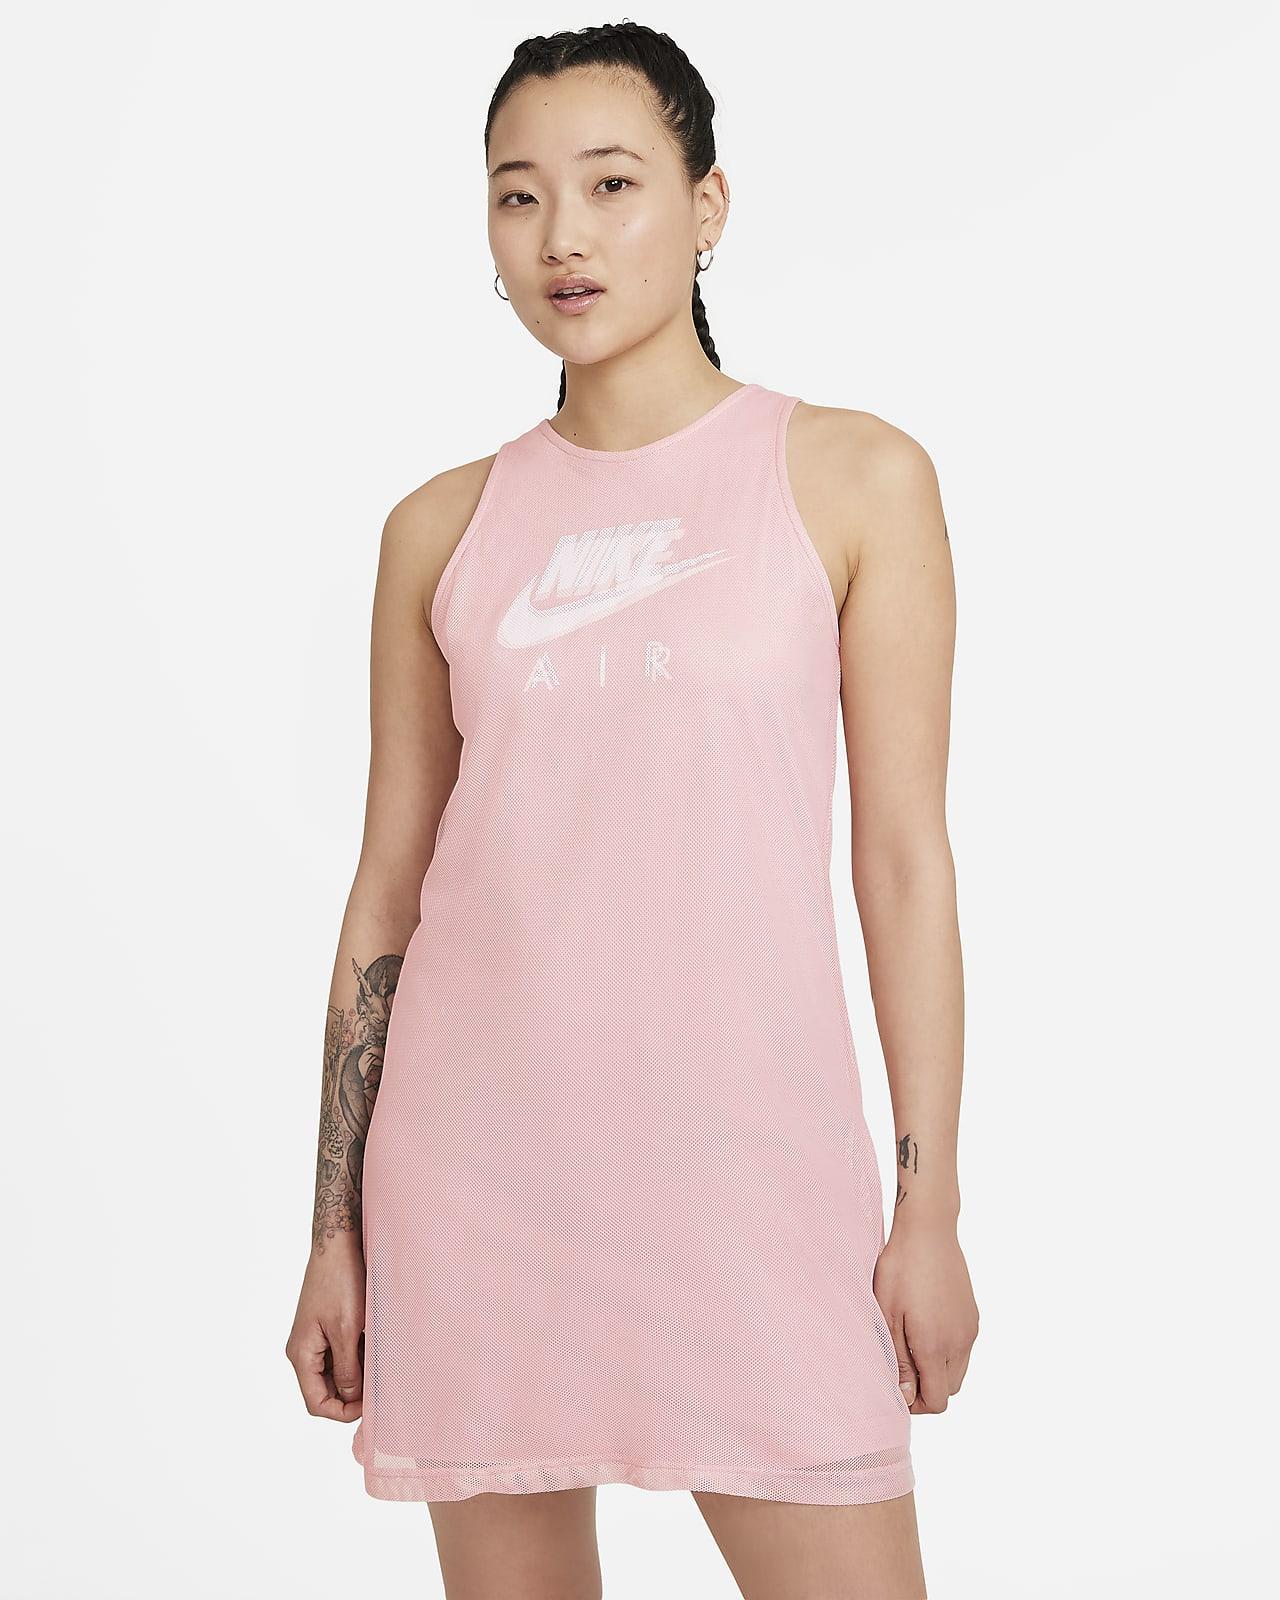 Nike Air 女款洋裝